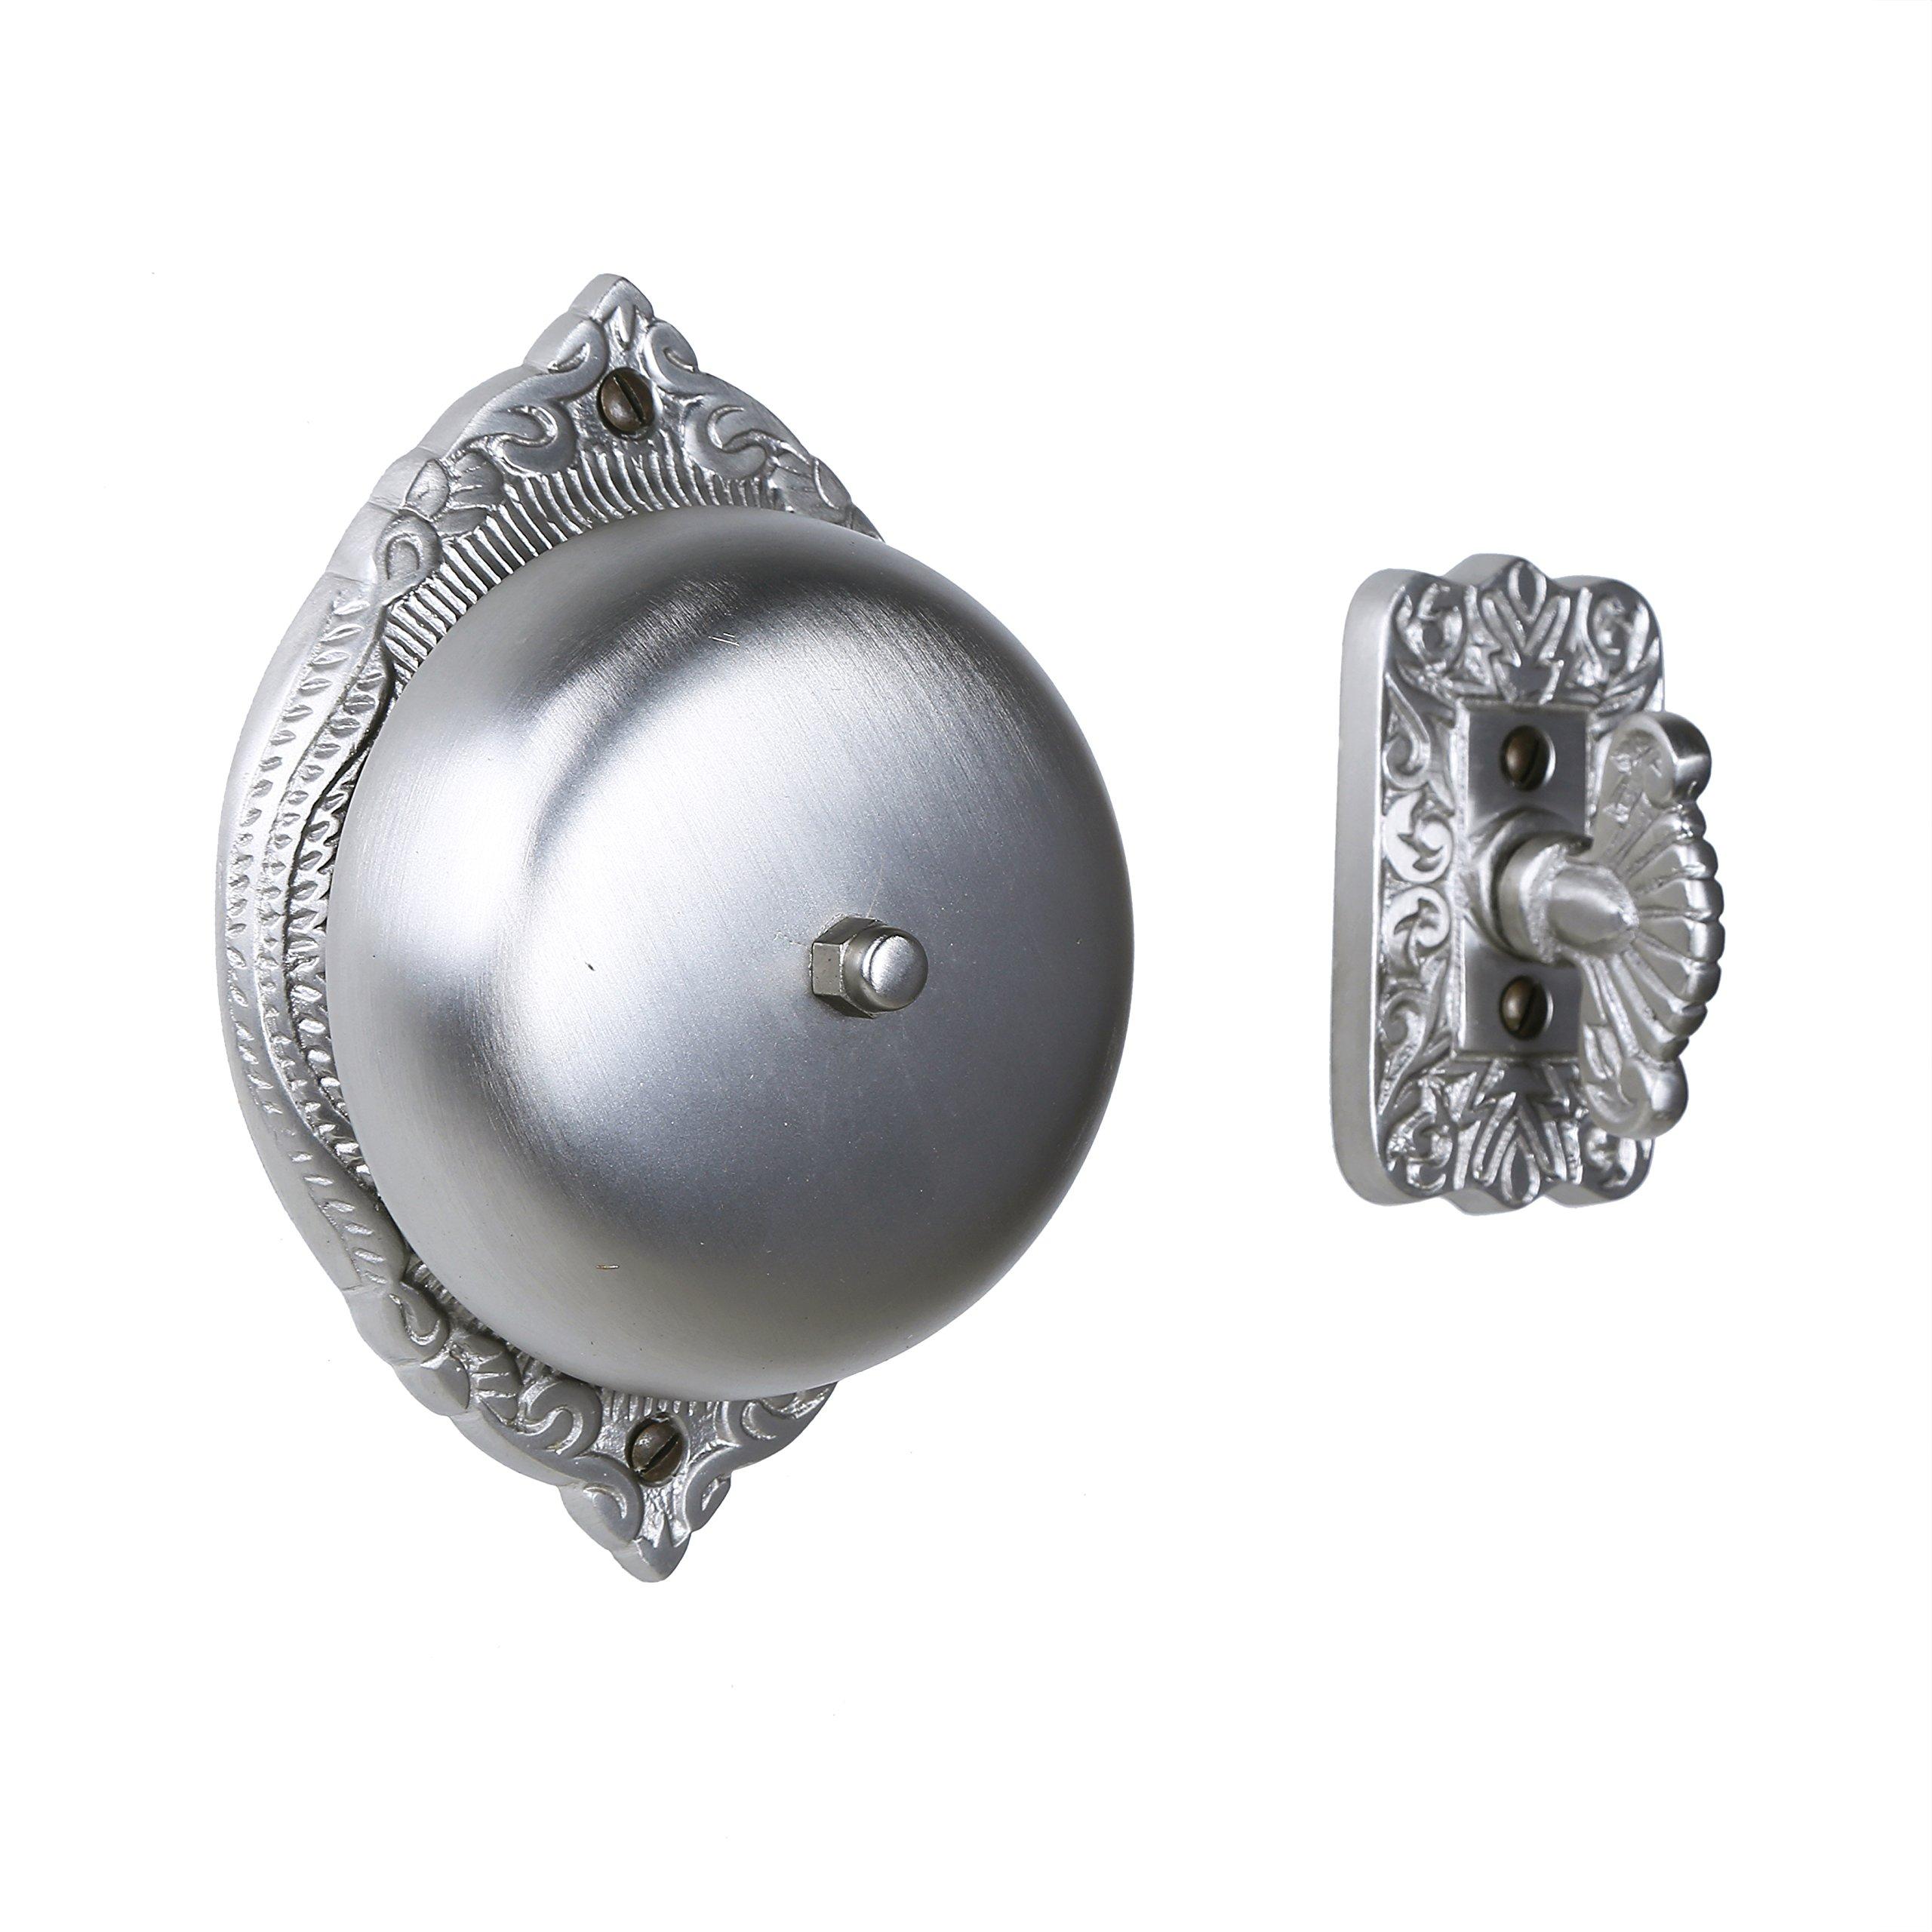 Twist Hand-Turn Solid Brass Wireless Mechanical Doorbell Chime in Satin Nickel Finish, Vintage Antique Victorian Decorative Door Bell with Easy Installation